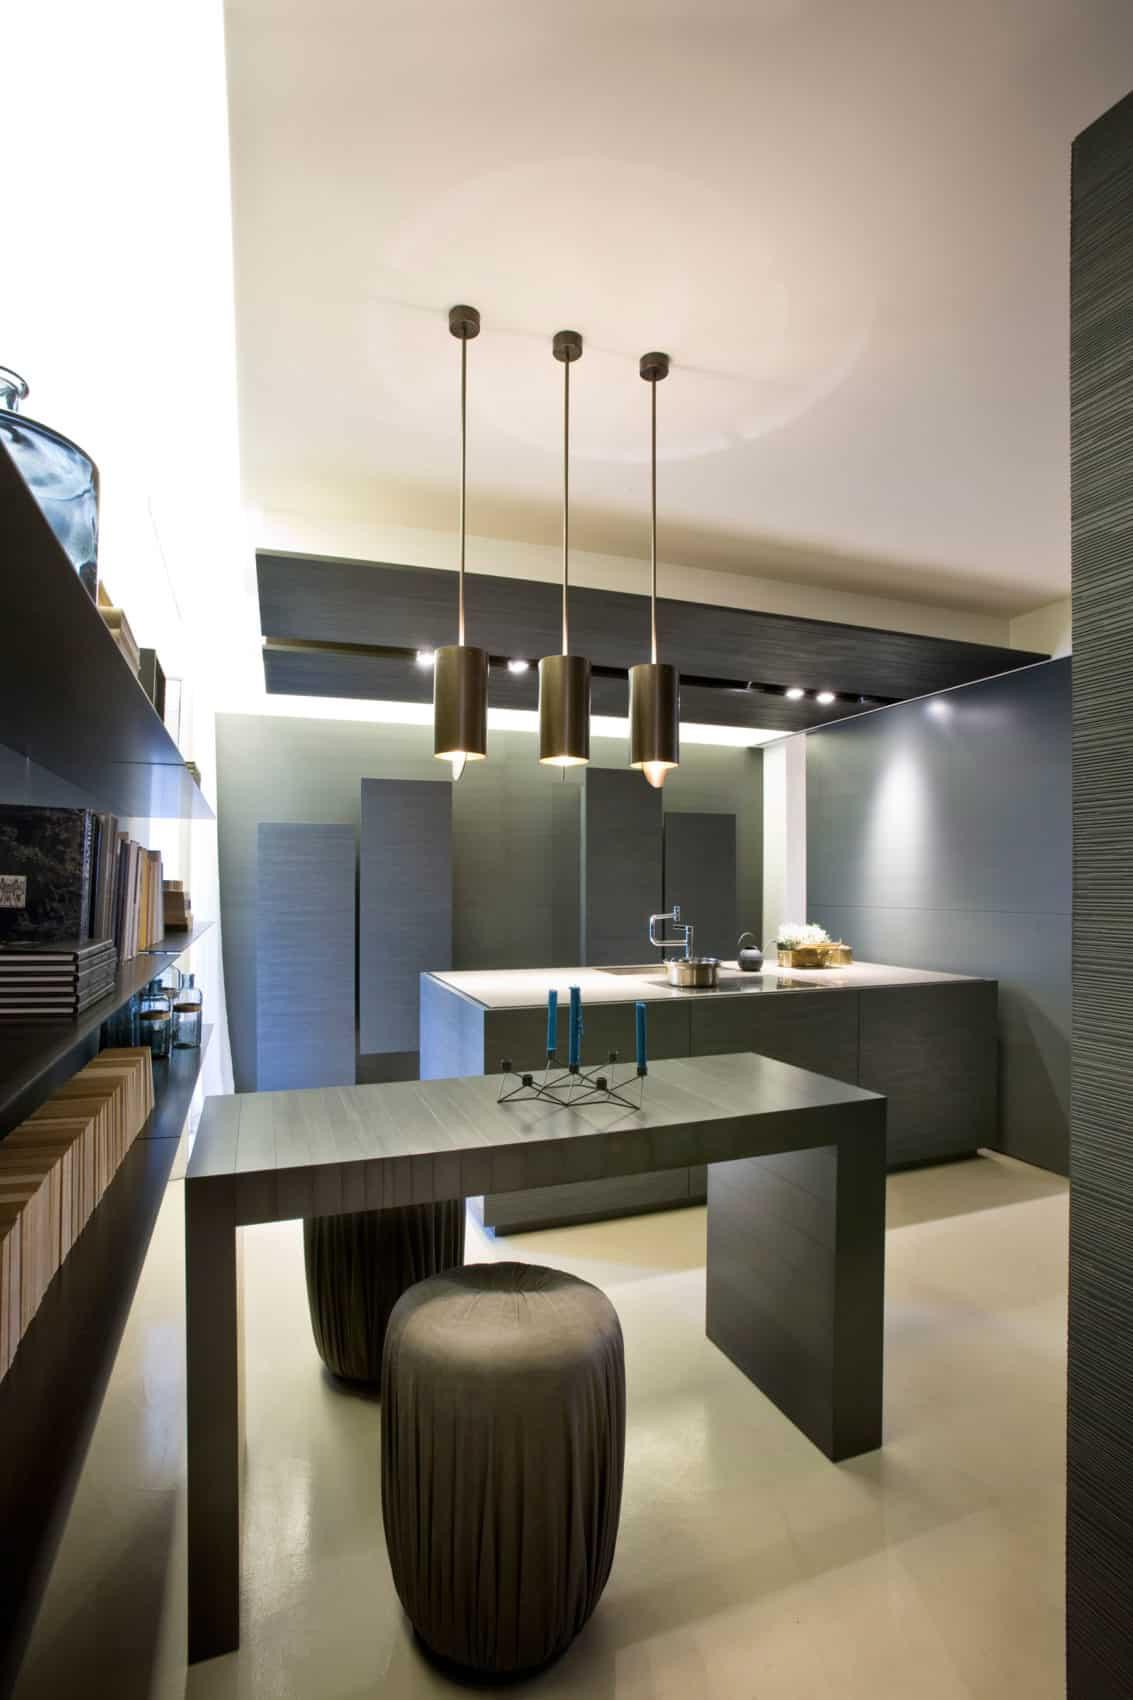 Lounge Living Project by Bartoli Design (13)